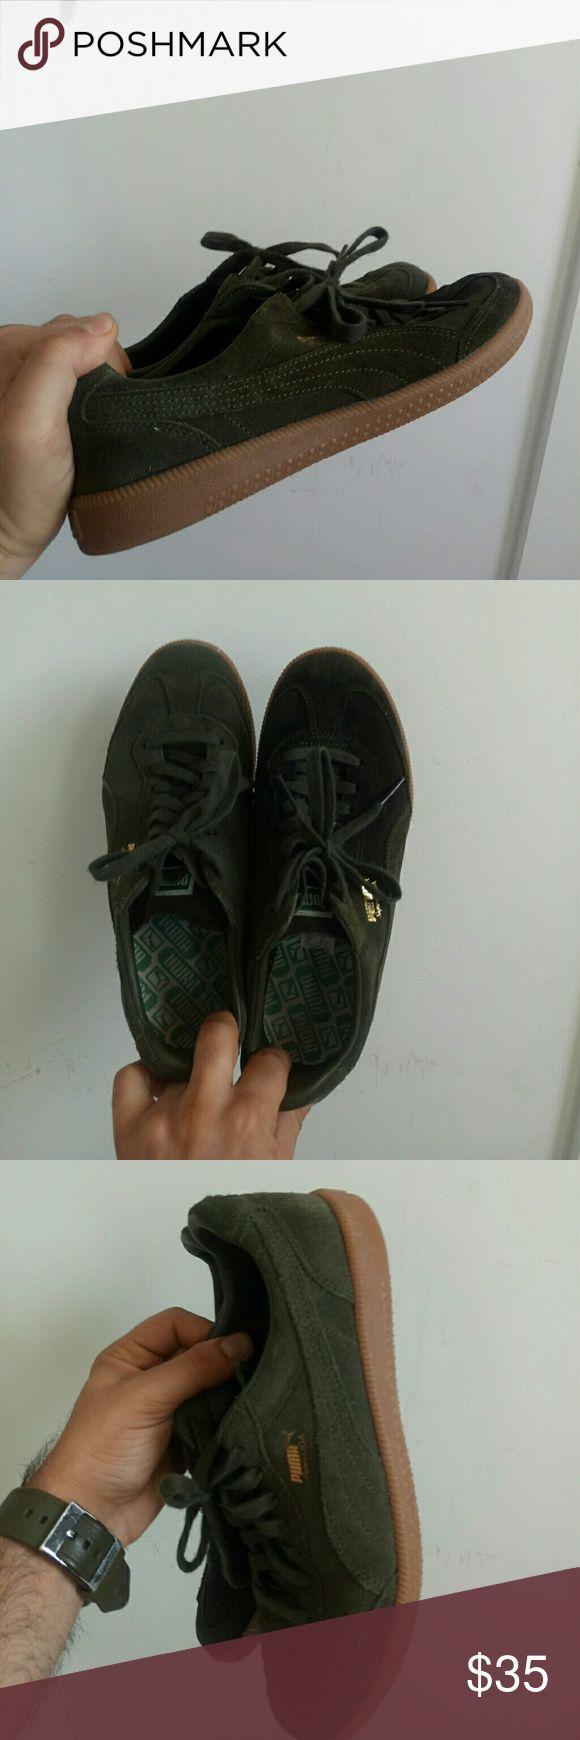 Puma Liga suede military green gum sole Almost never worn puma Liga suede green, casual for every occasion Puma Shoes Sneakers